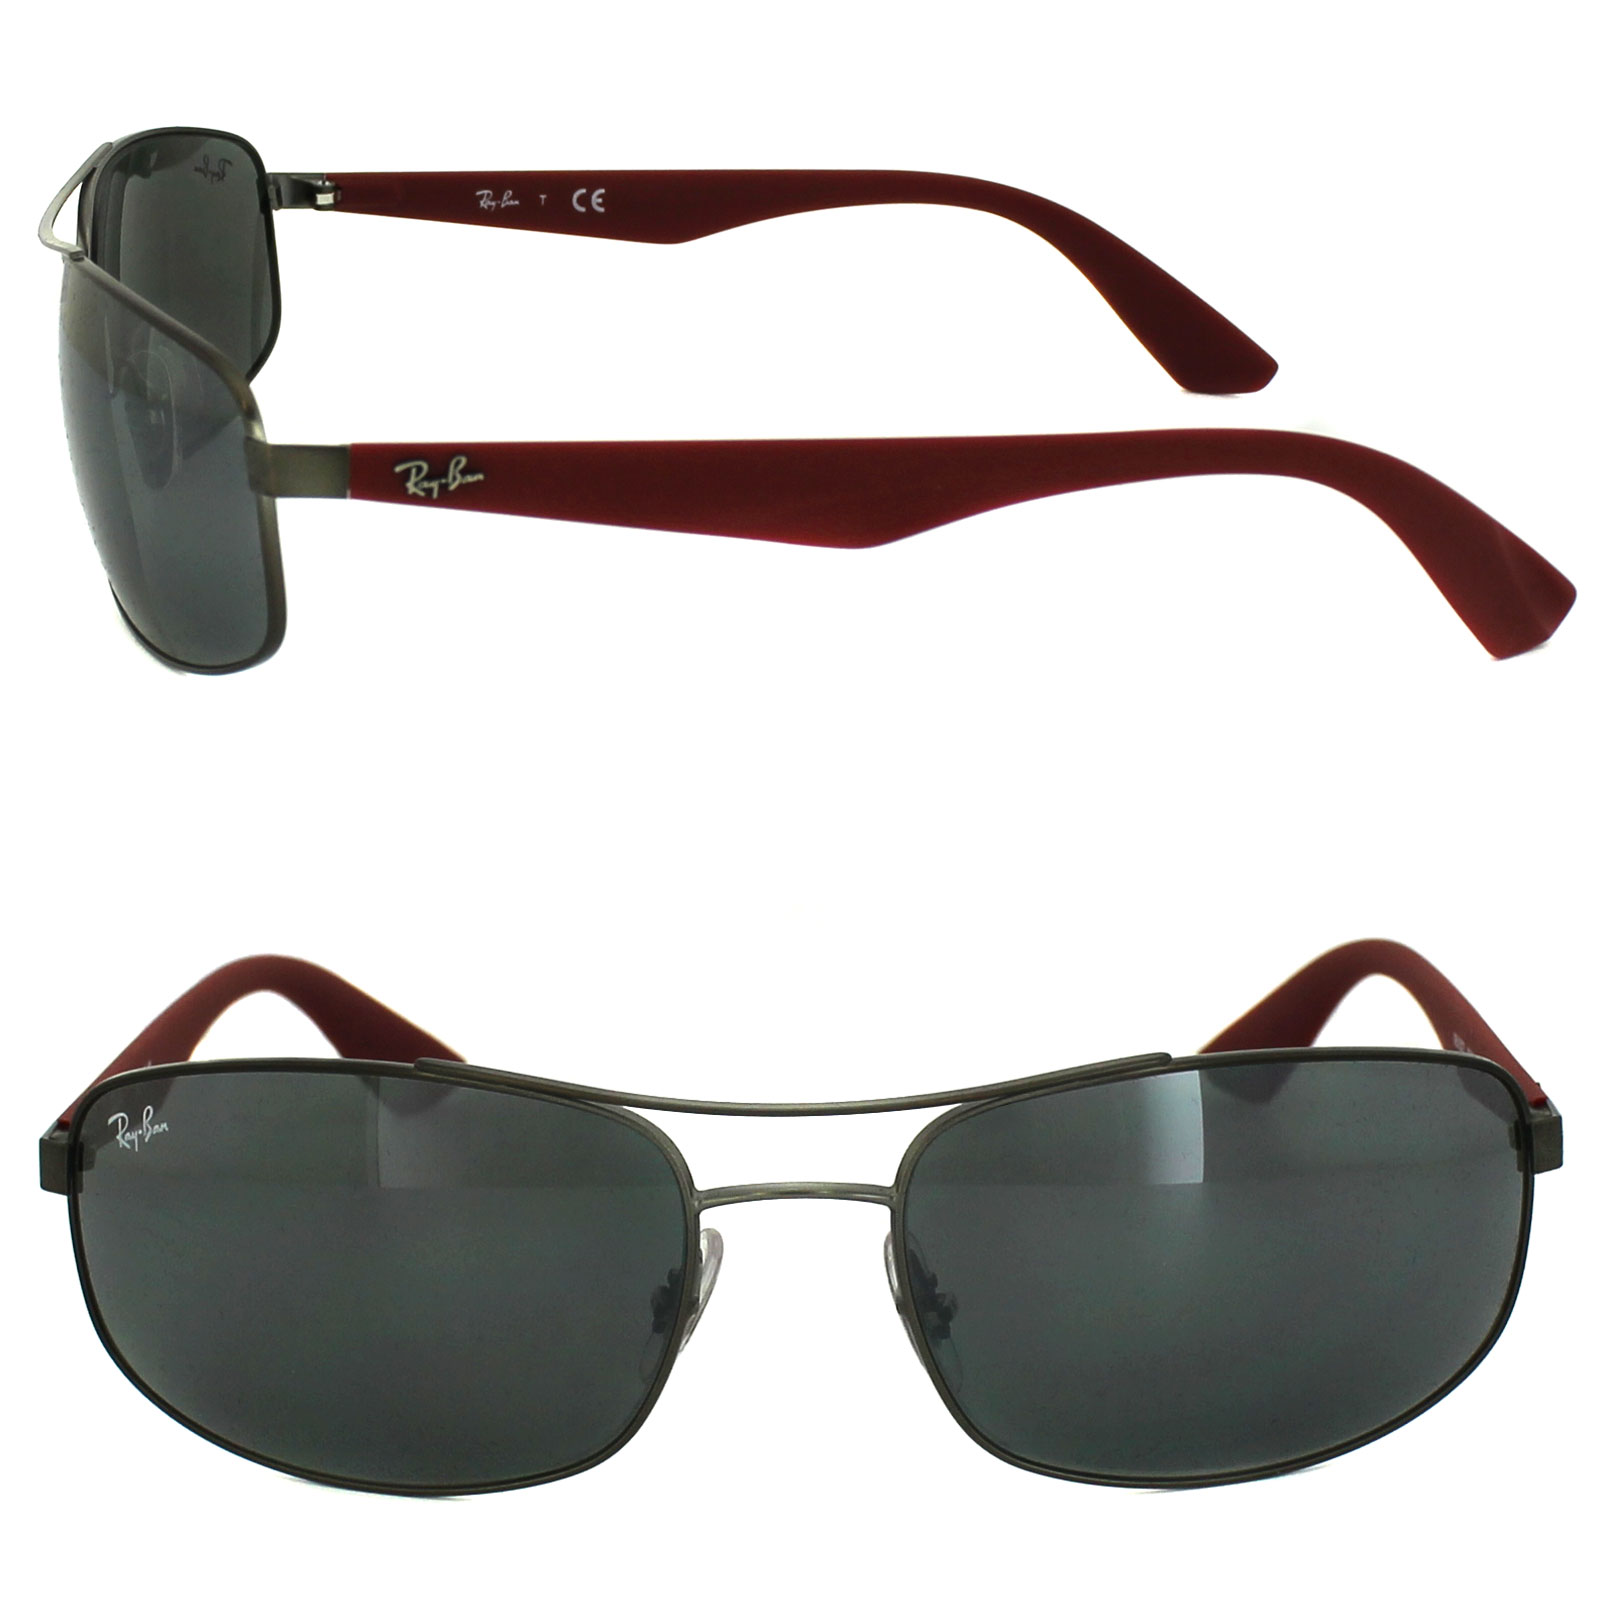 e59ed85e3dd Cheap Ray-Ban 3527 Sunglasses - Discounted Sunglasses